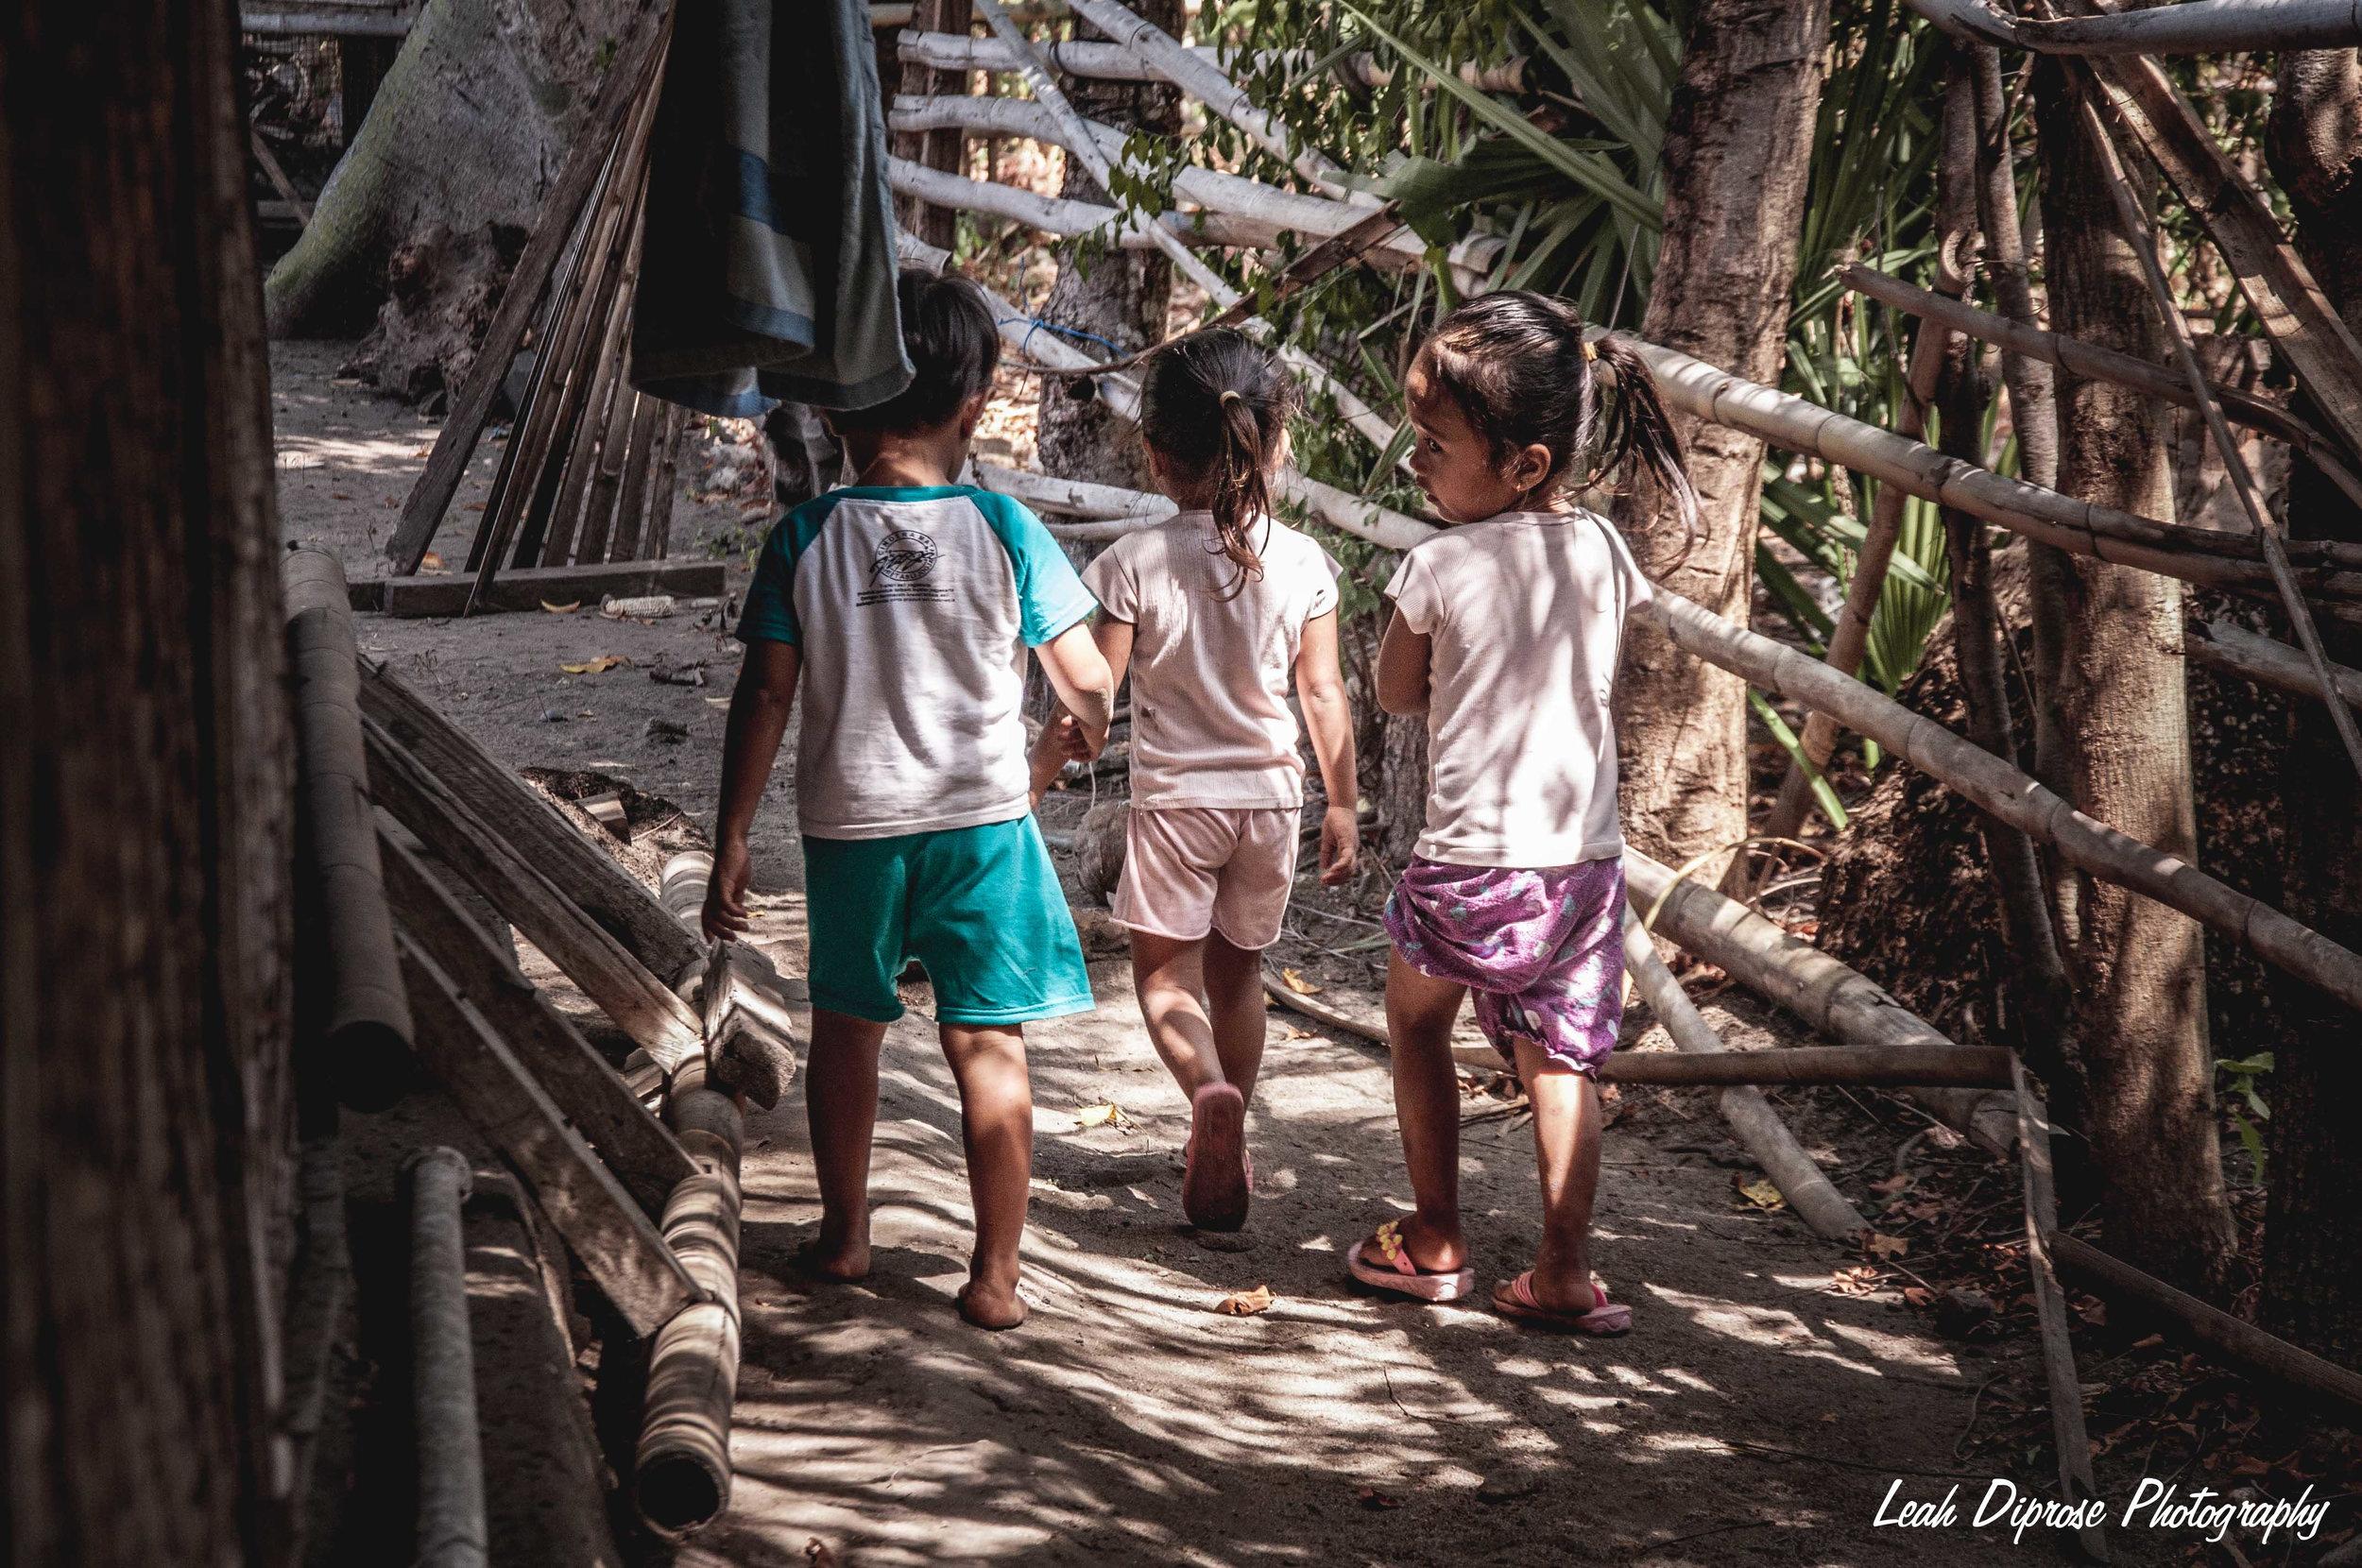 Leah Diprose Photography image-5136.jpg